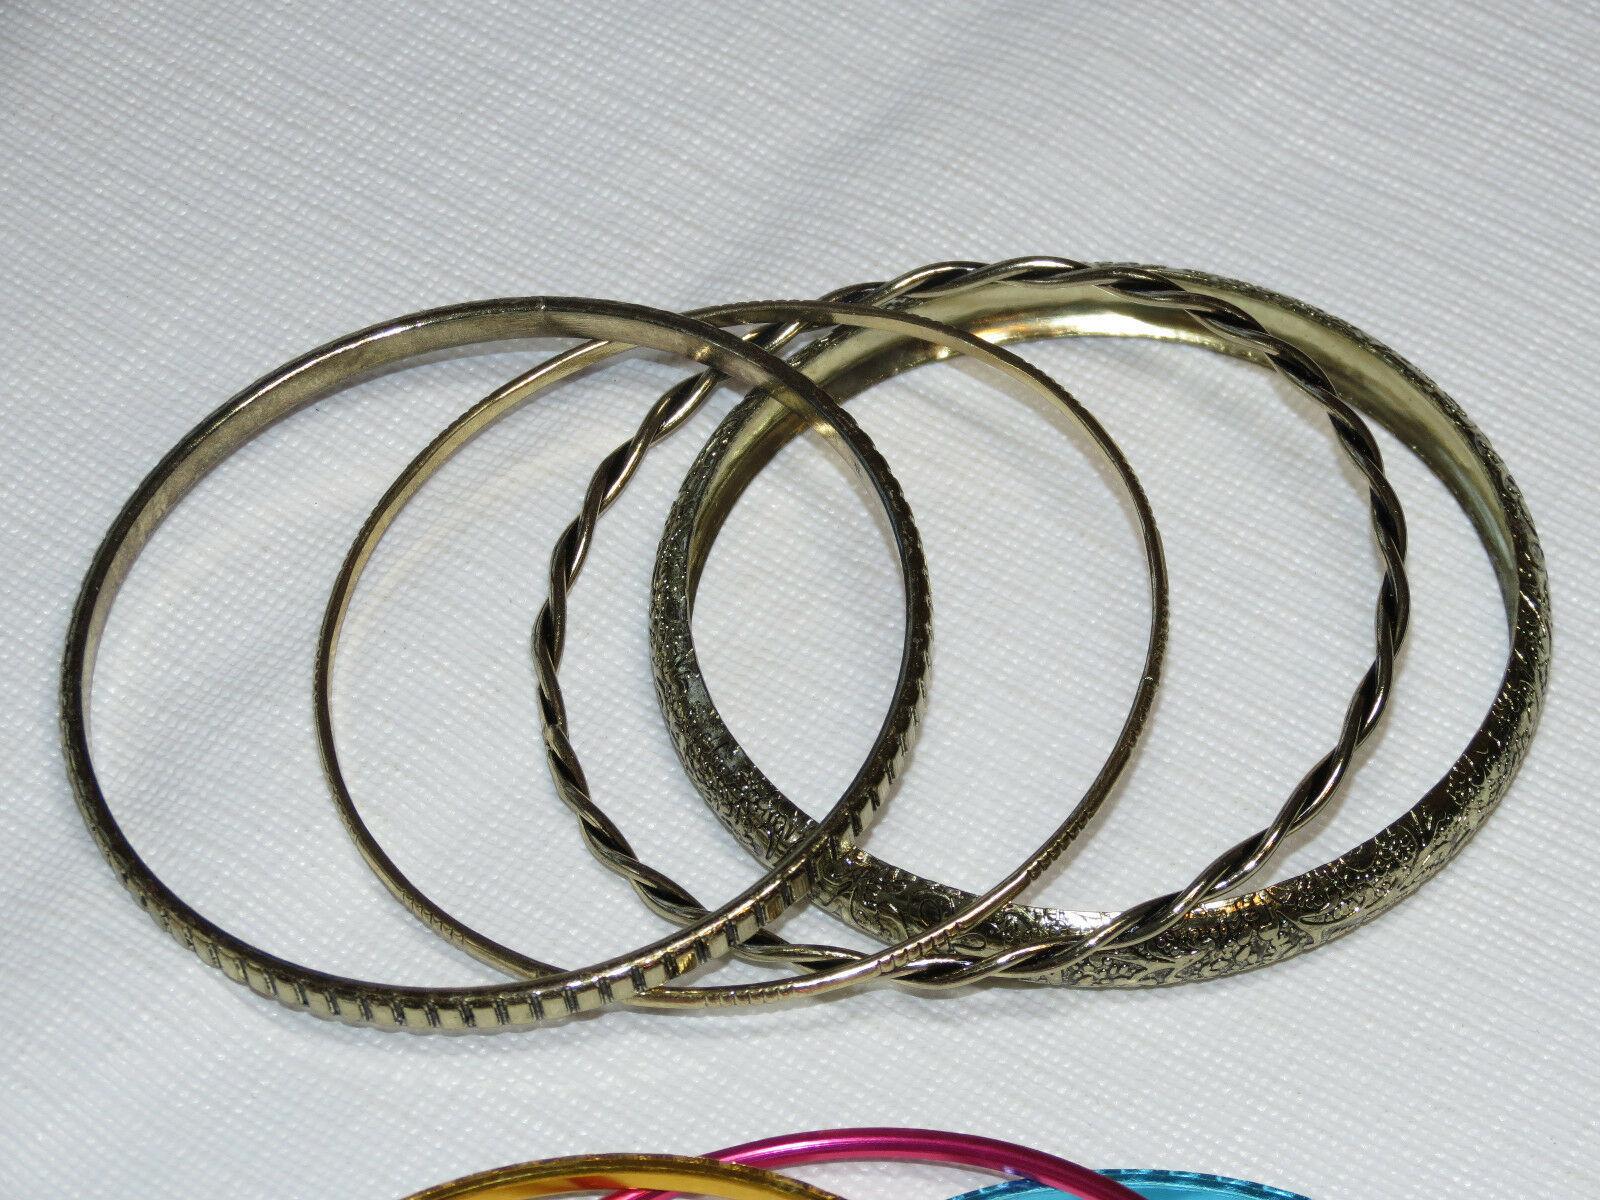 Femmes Avon Hawaïen Shores Bracelet Petit 7 Bracelets Multi F3610691 Nip image 3